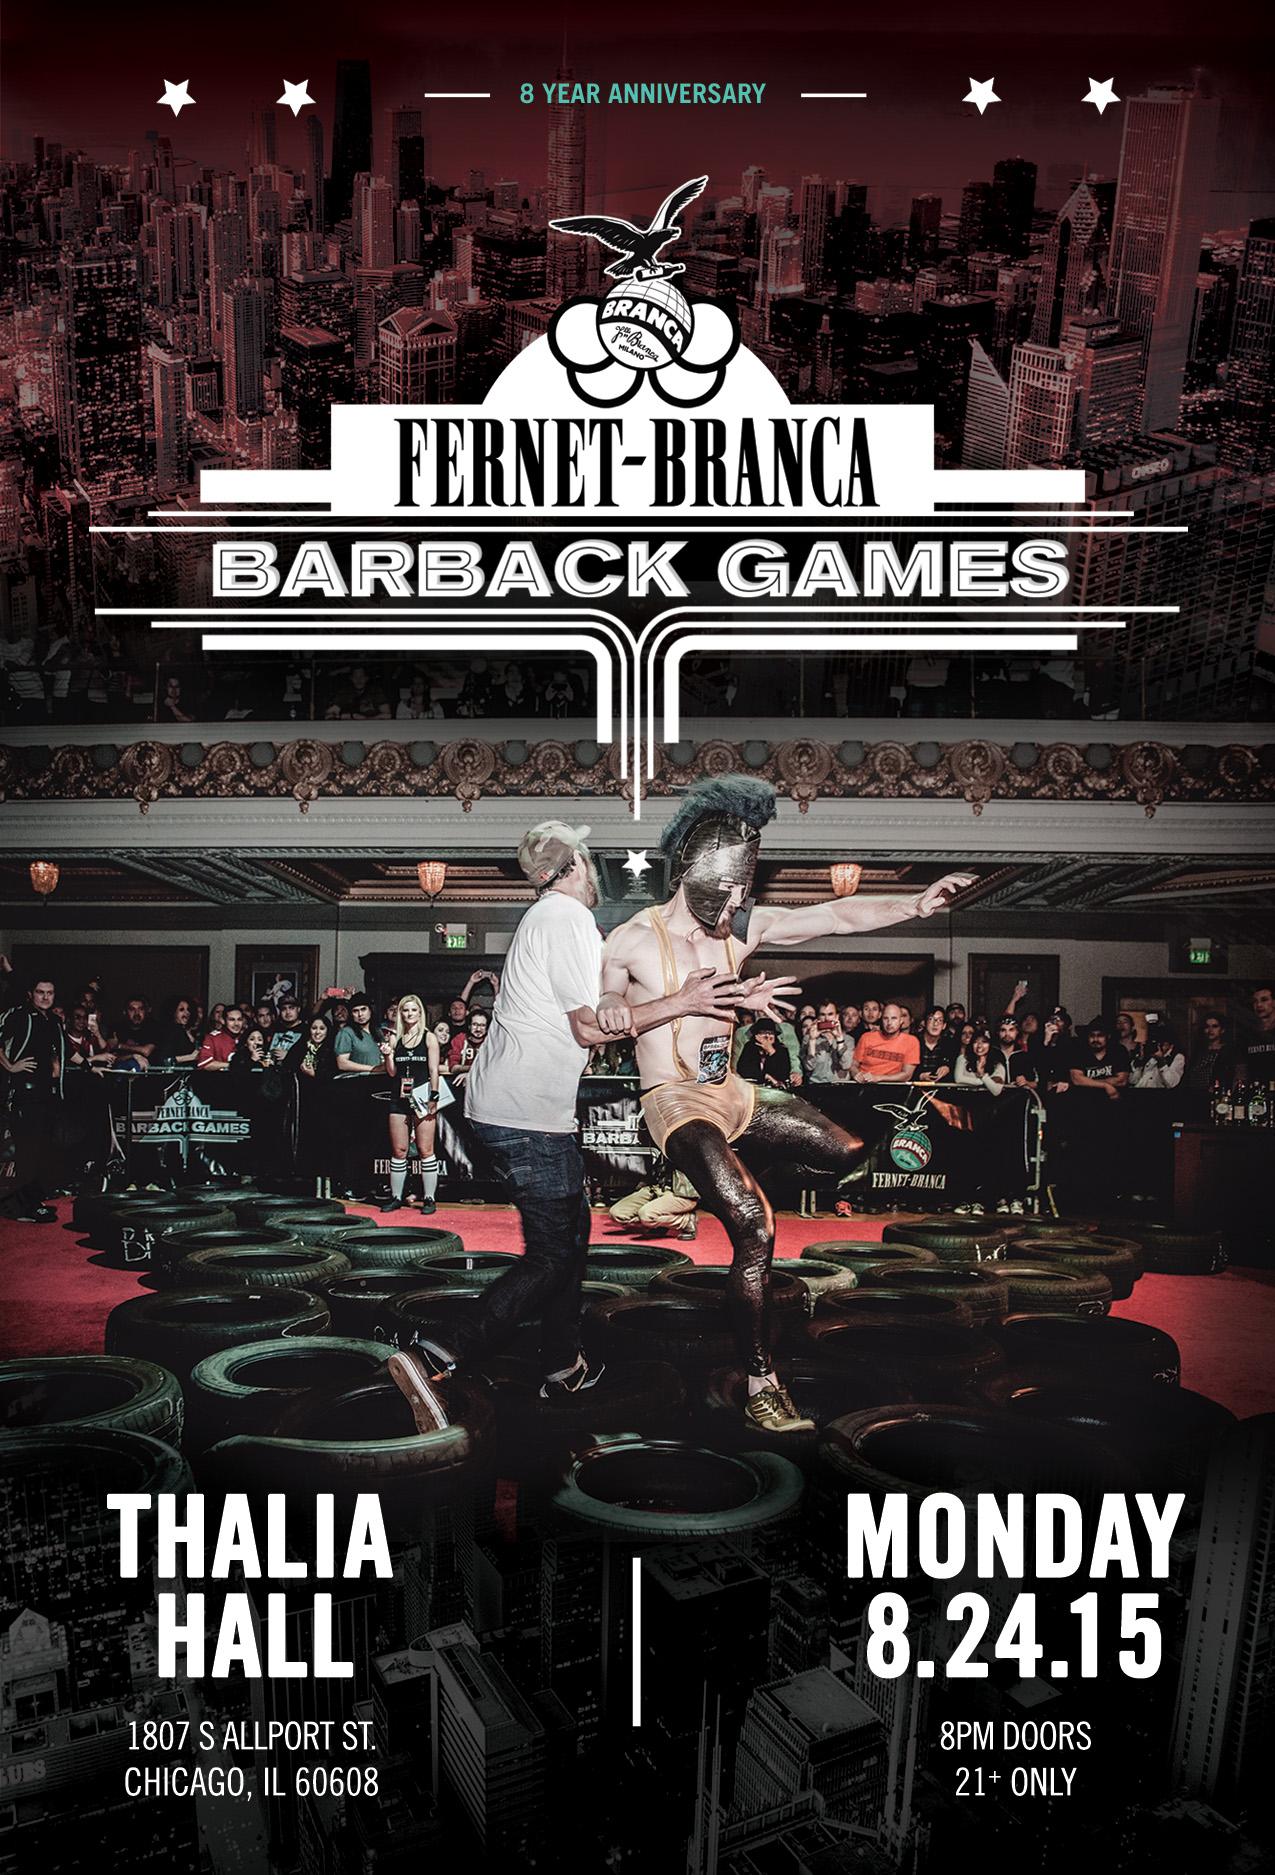 fernet-branca barback games 2015 - chicago tickets, mon, aug 24